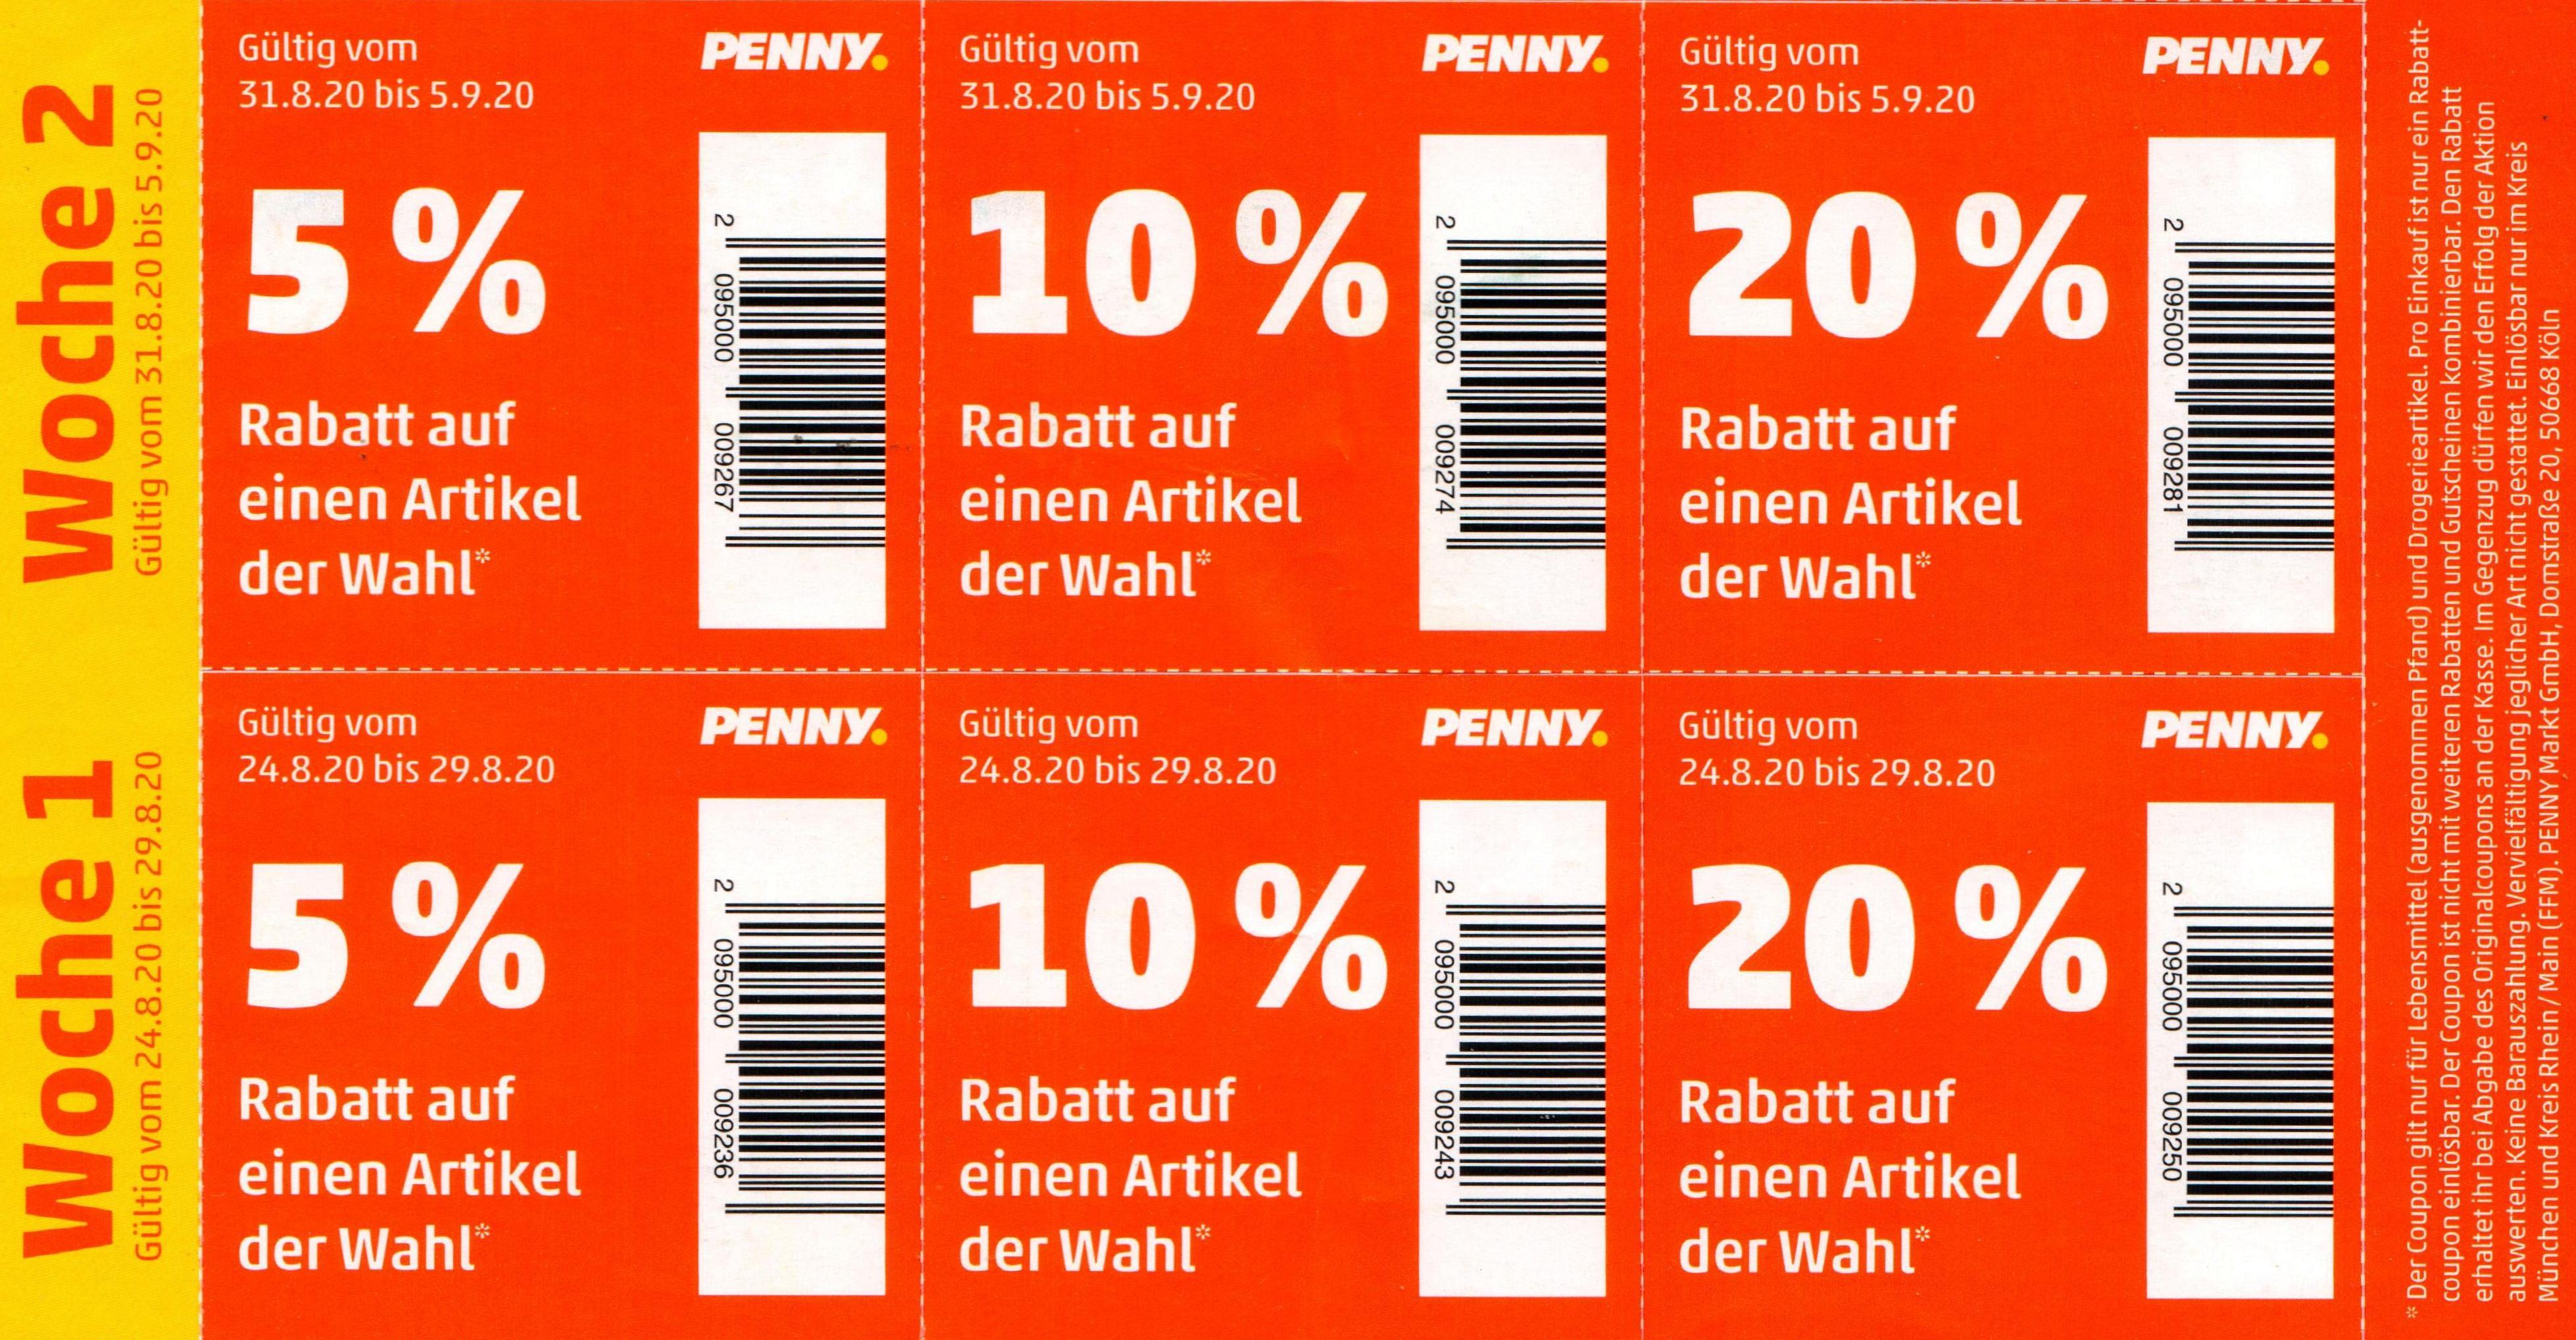 [Penny] evtl nur Lokal: 5% / 10% / 20% Rabatt-Coupon Aufkleber im Prospekt bis 05.09.2020 (KW35/36)